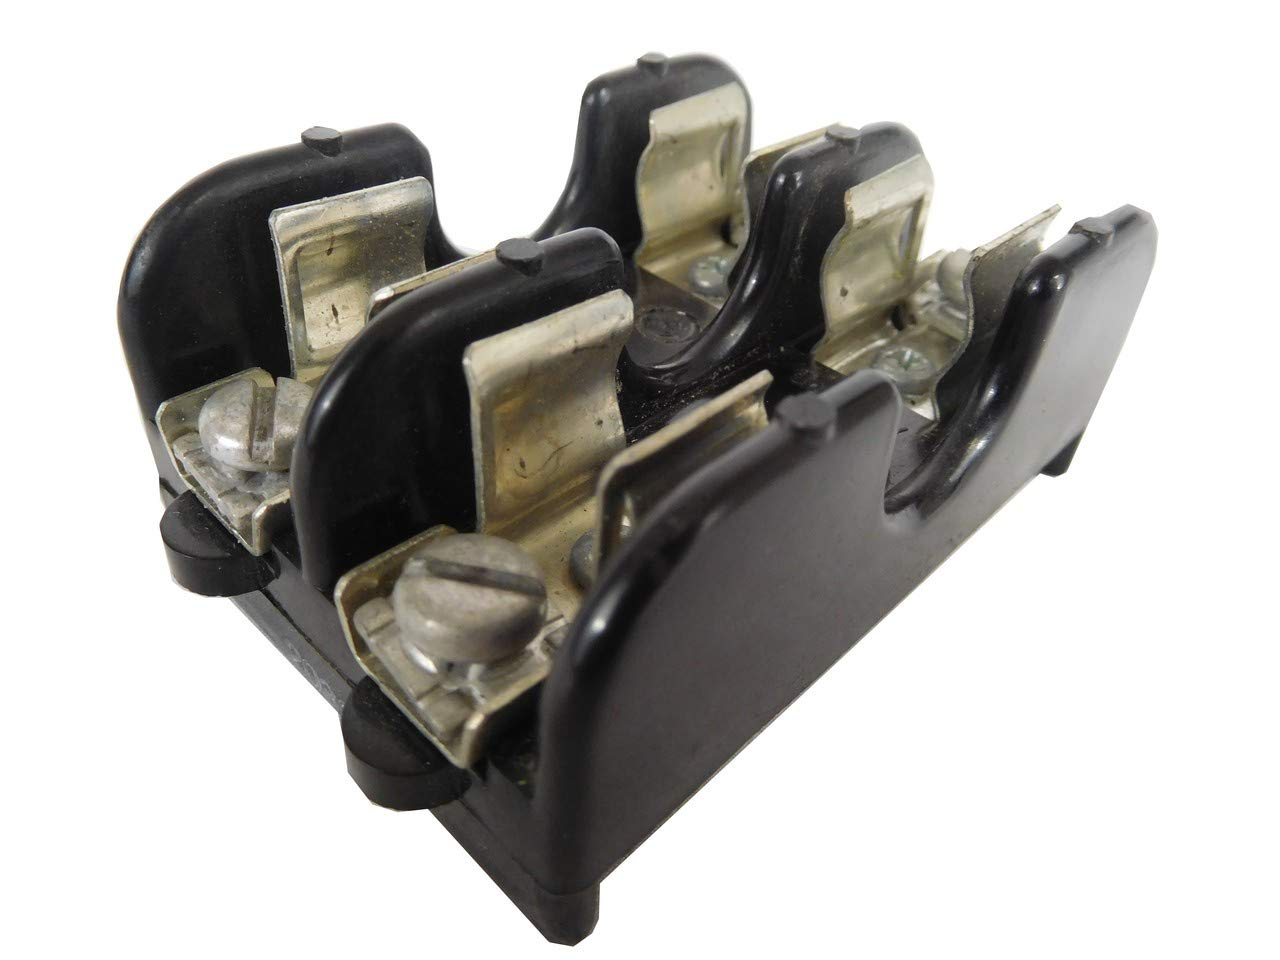 taylor 20322 fuse block holder 2 position 1 pkg 250v 30a 2p fuse box chart wiring diagram